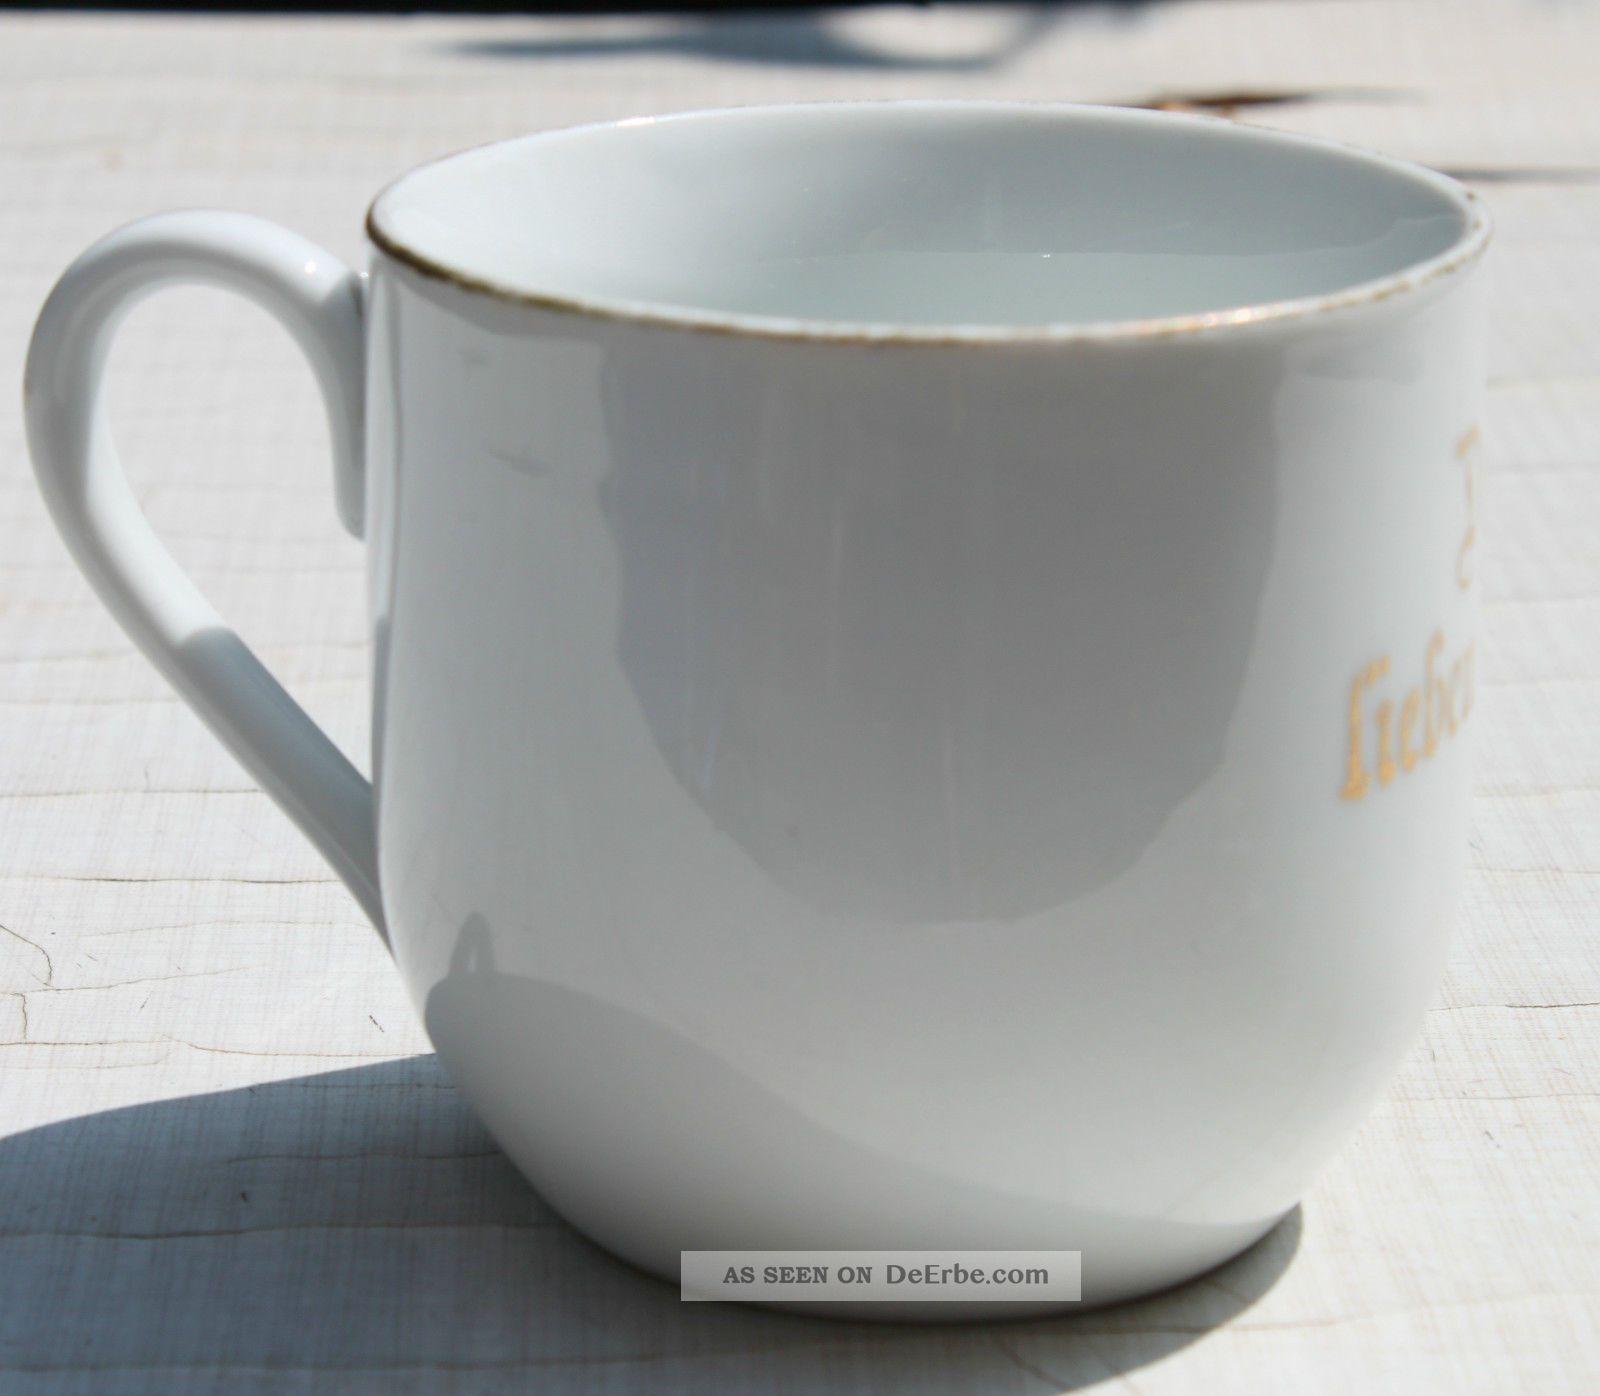 becher kaffeebecher porzellan tasse dem lieben vater vatertag geburtstag. Black Bedroom Furniture Sets. Home Design Ideas